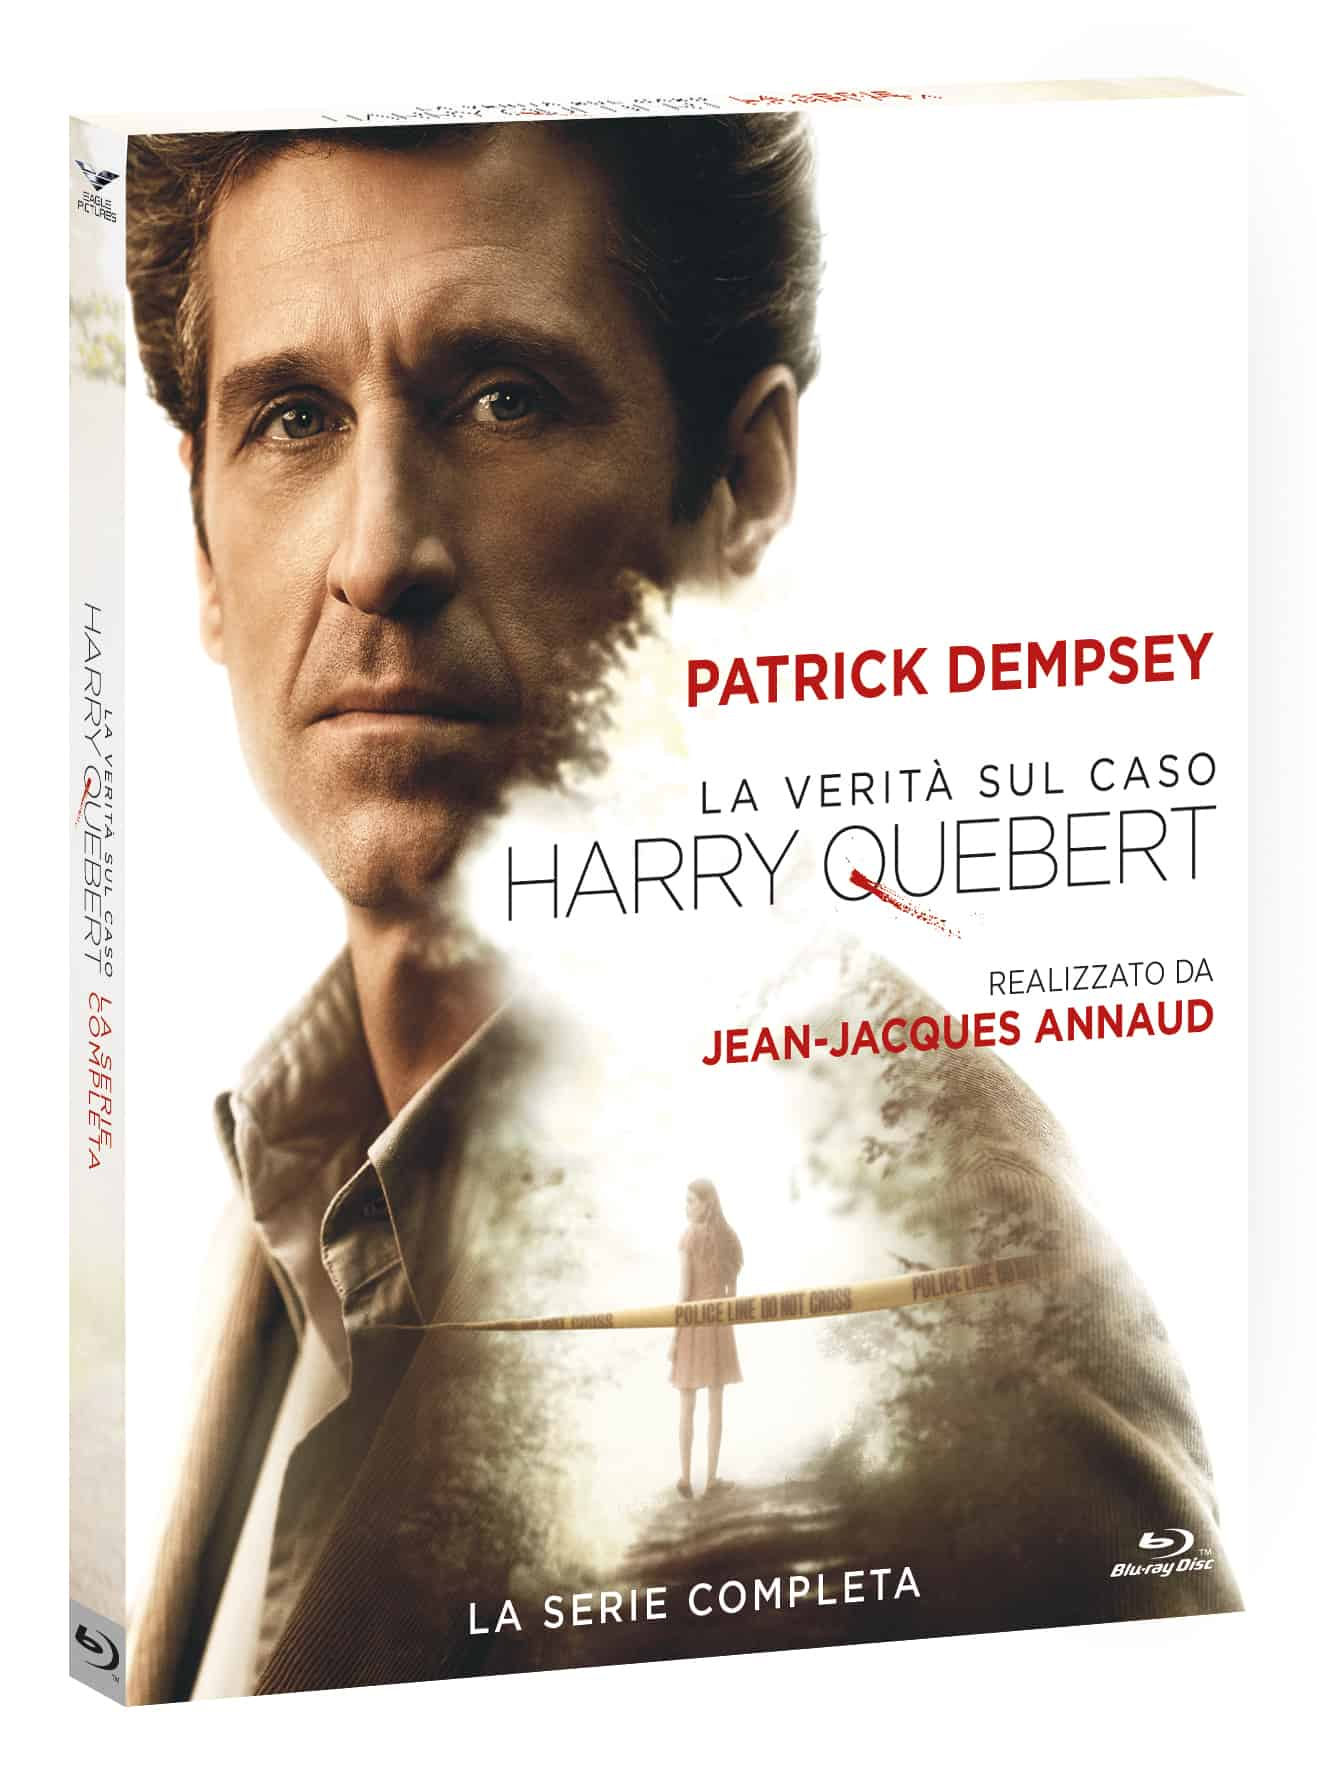 La Verita Harry Quebert Bluray copertina